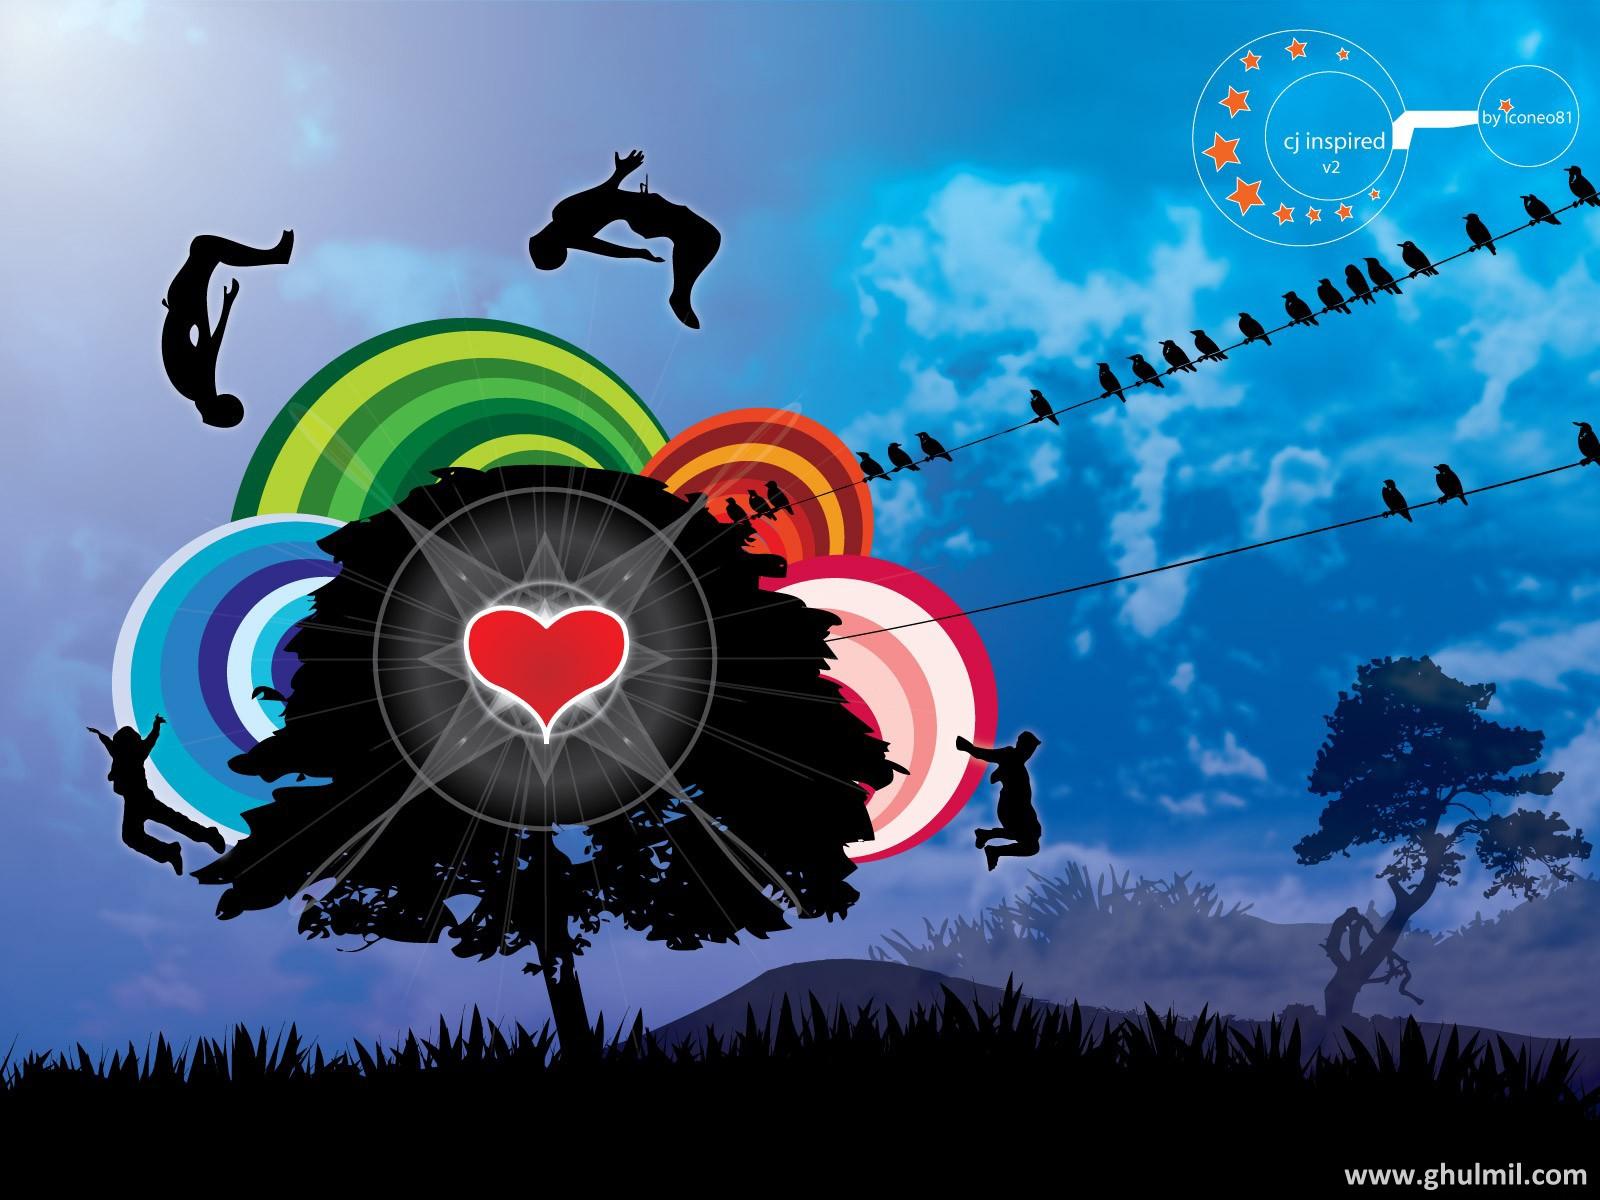 Hd love wallpapers hd wallpapers pulse - Love f wallpaper hd download ...